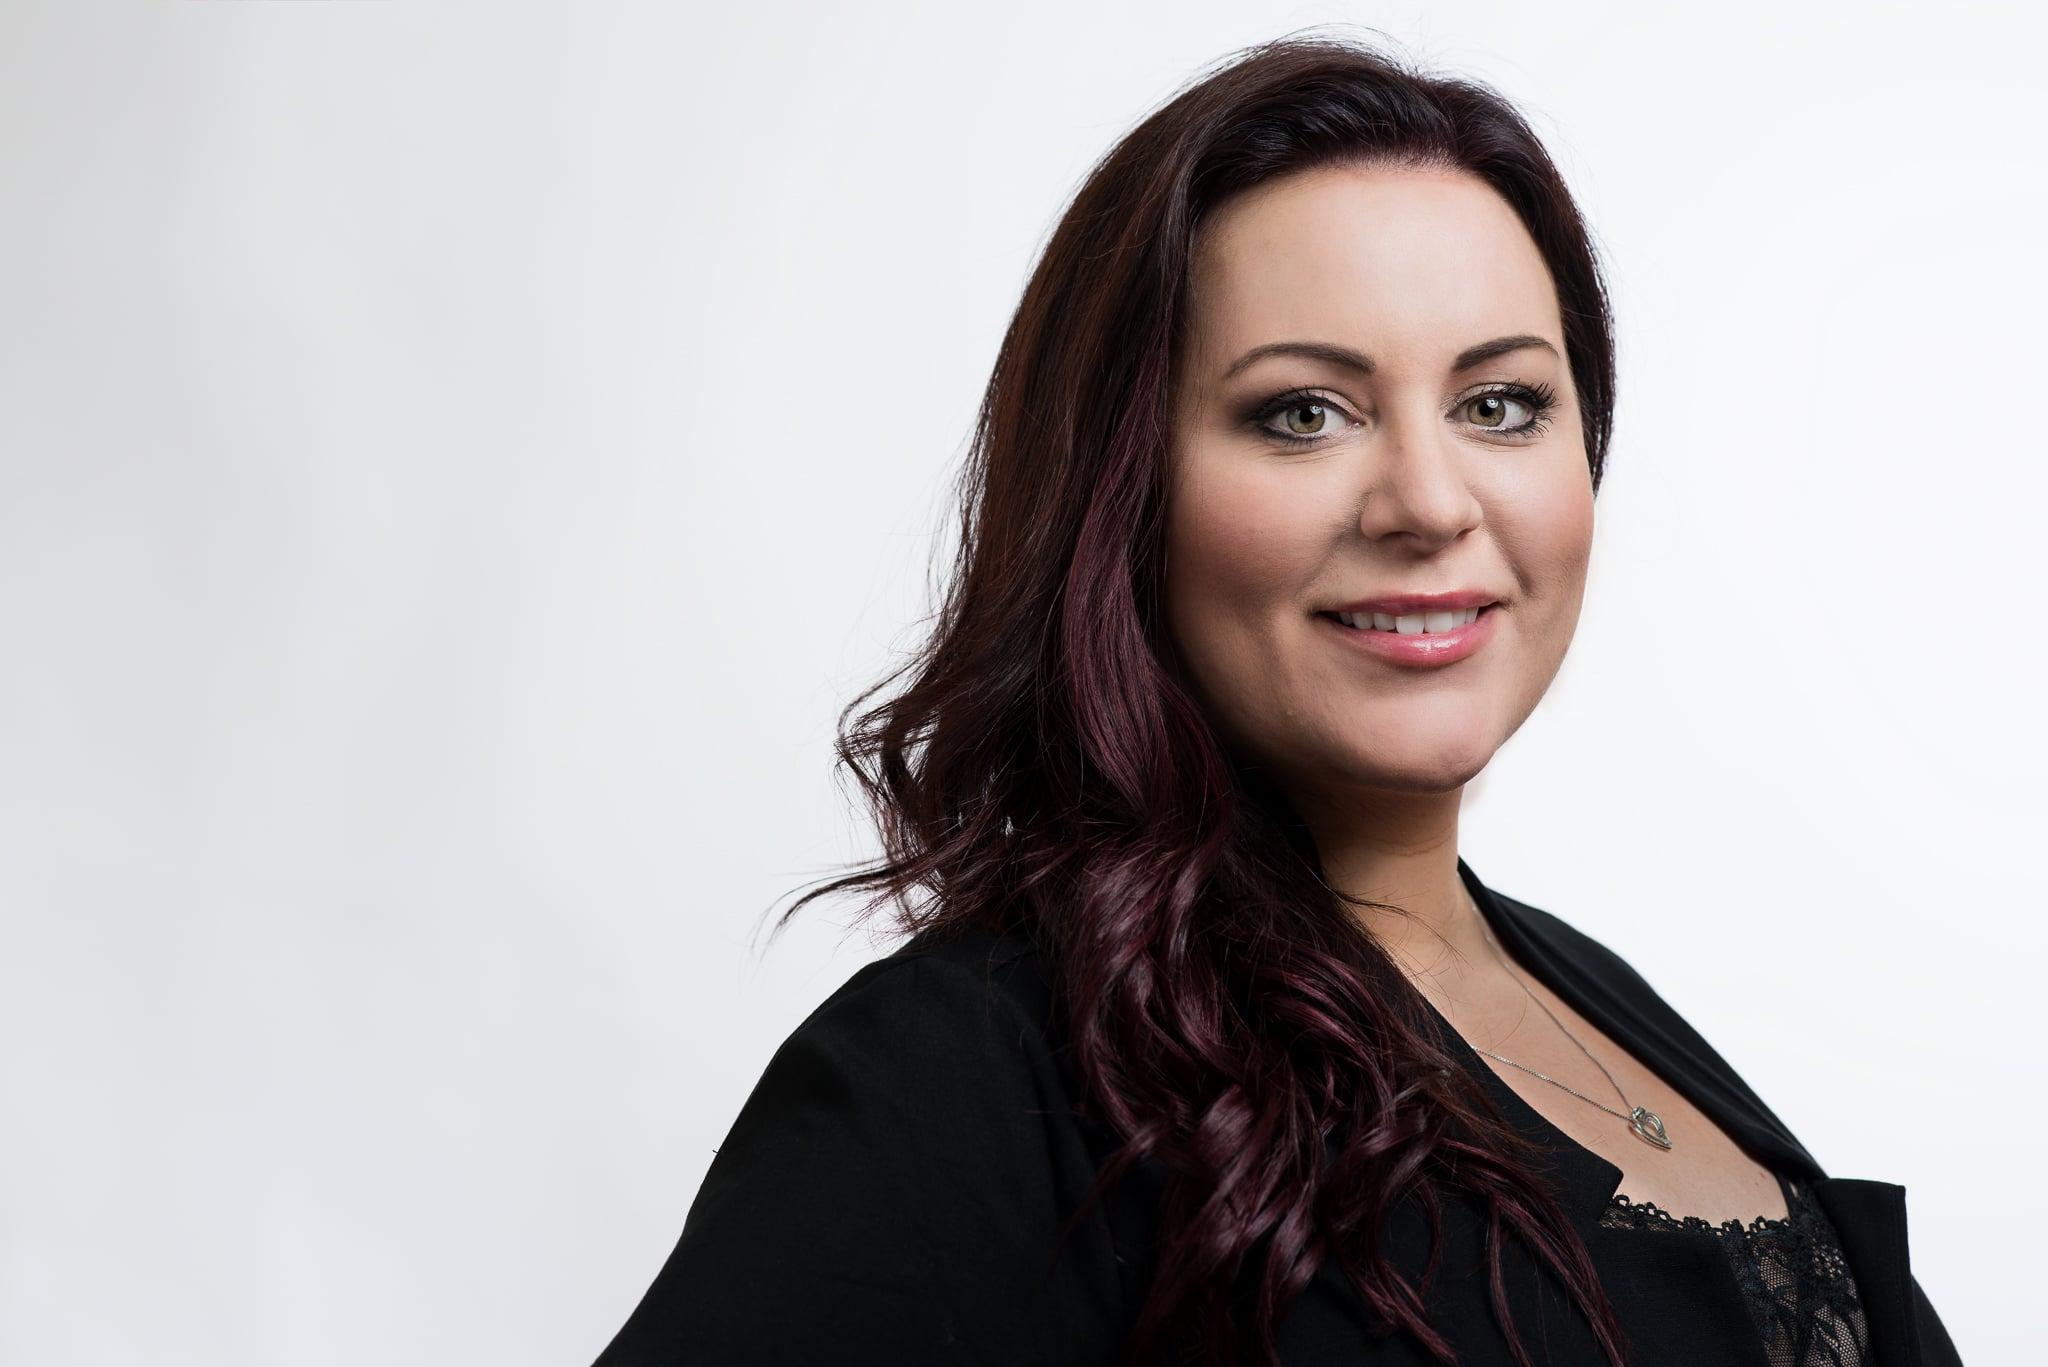 Lina Ivarsson